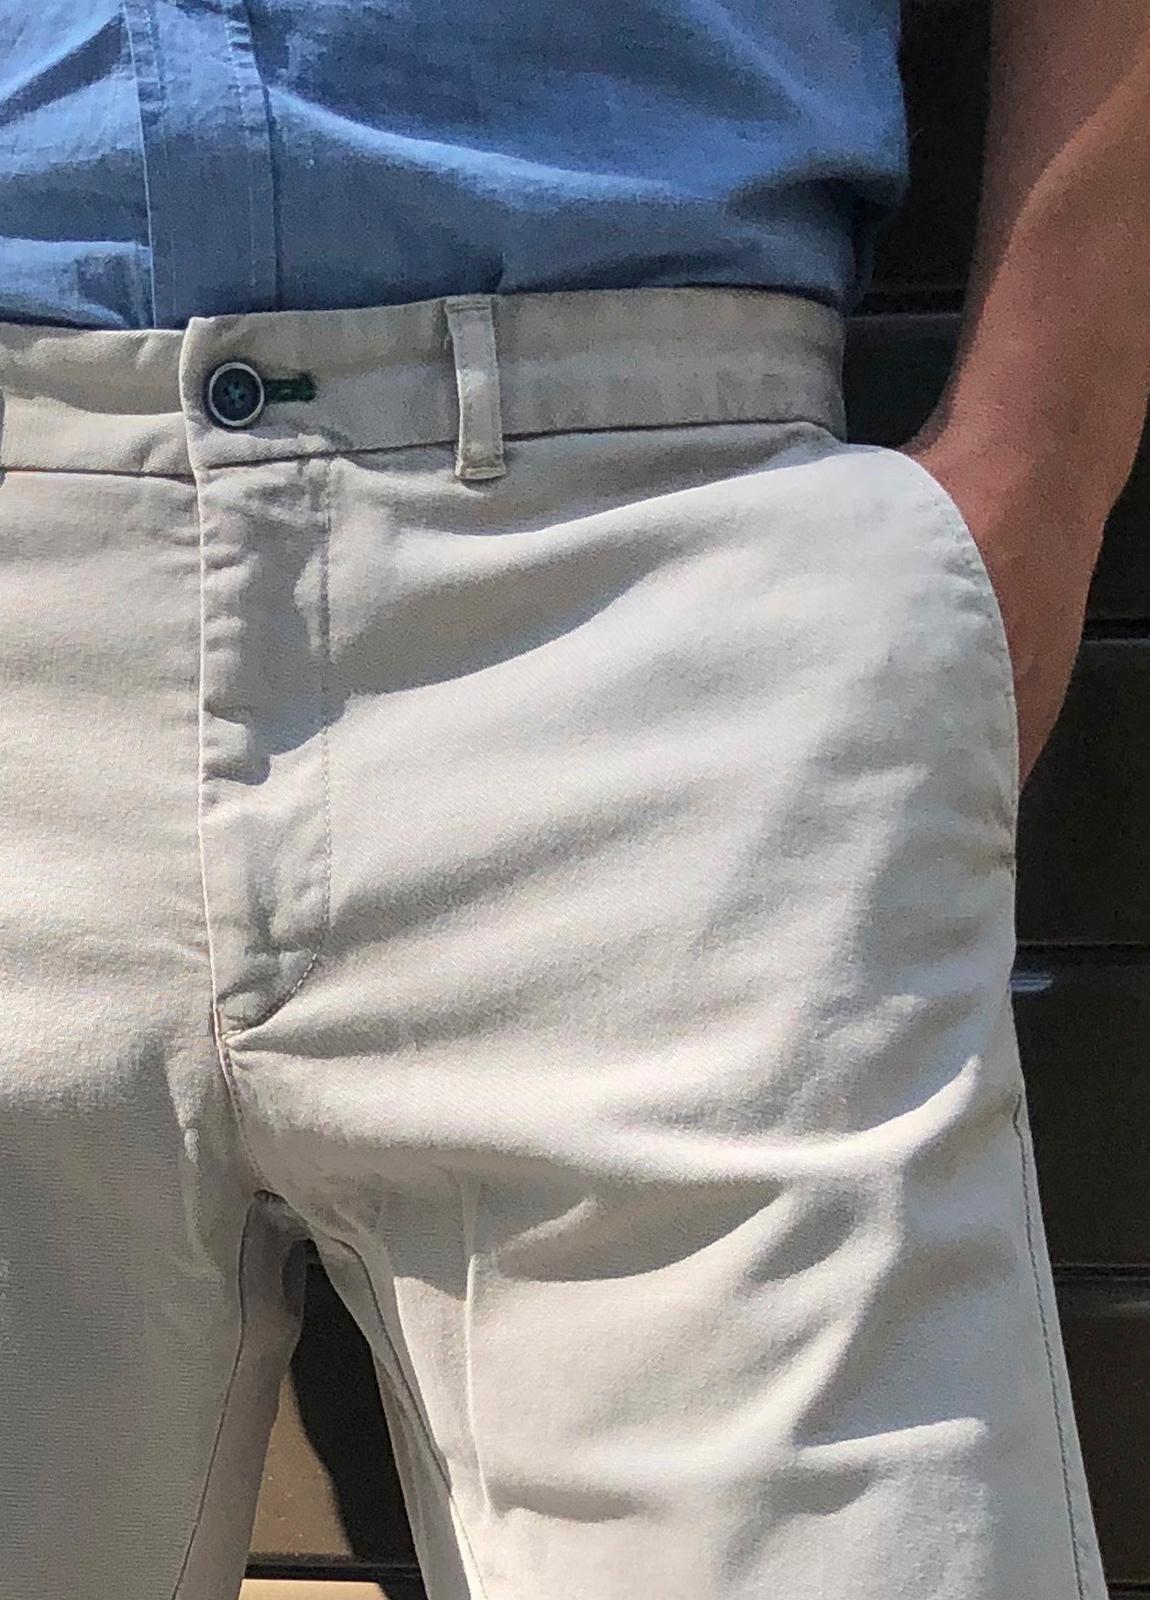 Bermuda modelo THOMAS color beige, 97% Algodón 3% Elastano - Ítem2